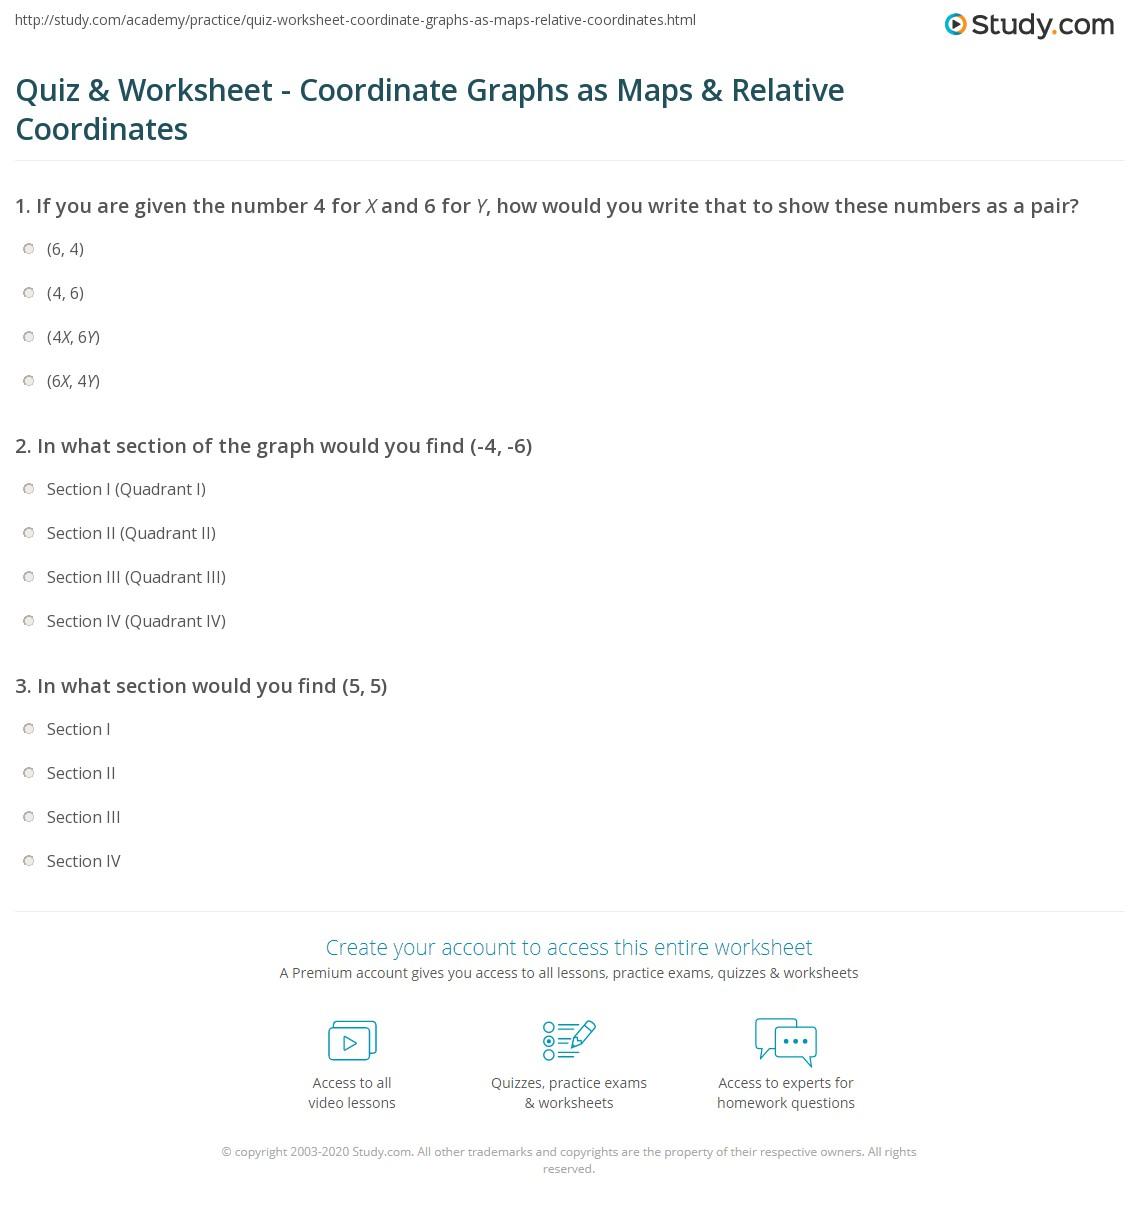 Quiz Worksheet Coordinate Graphs As Maps Relative Coordinates